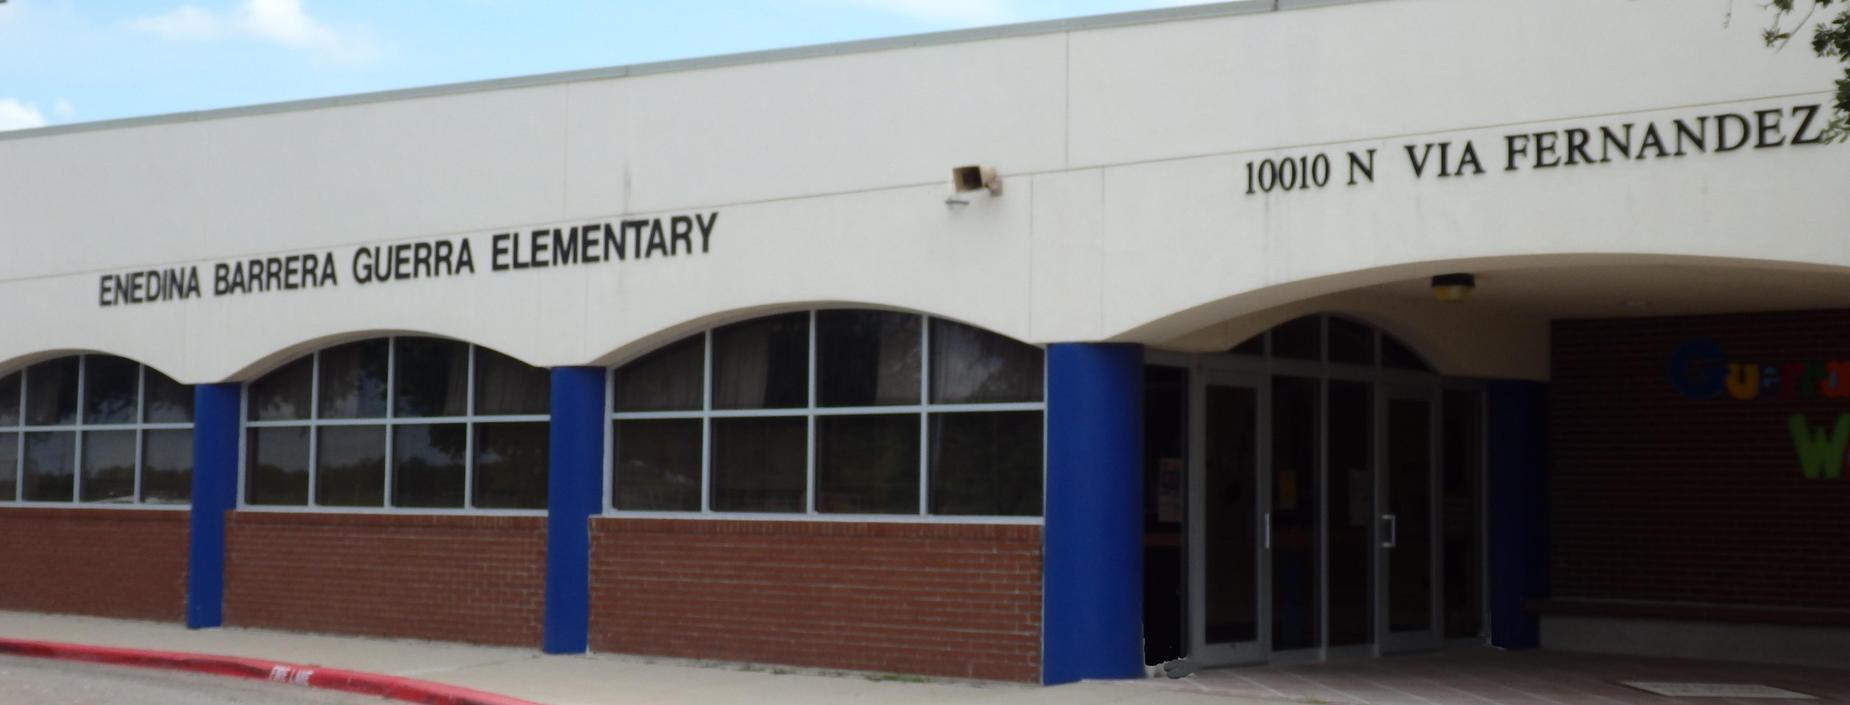 Image of E.B. Guerra Elementary